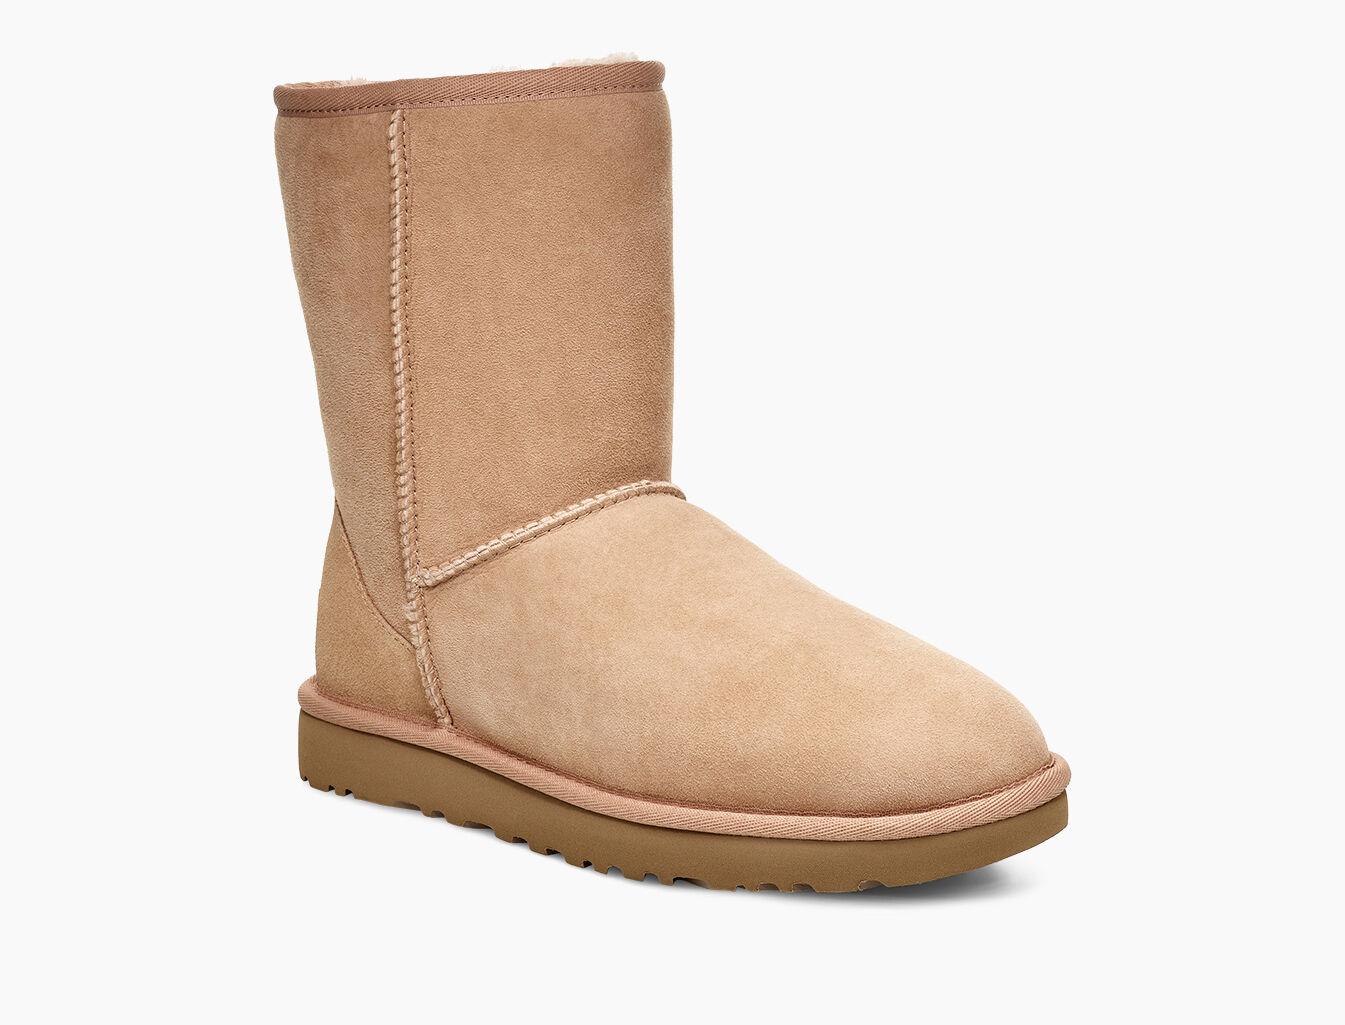 ugg classic sheepskin boots ugg official rh ugg com